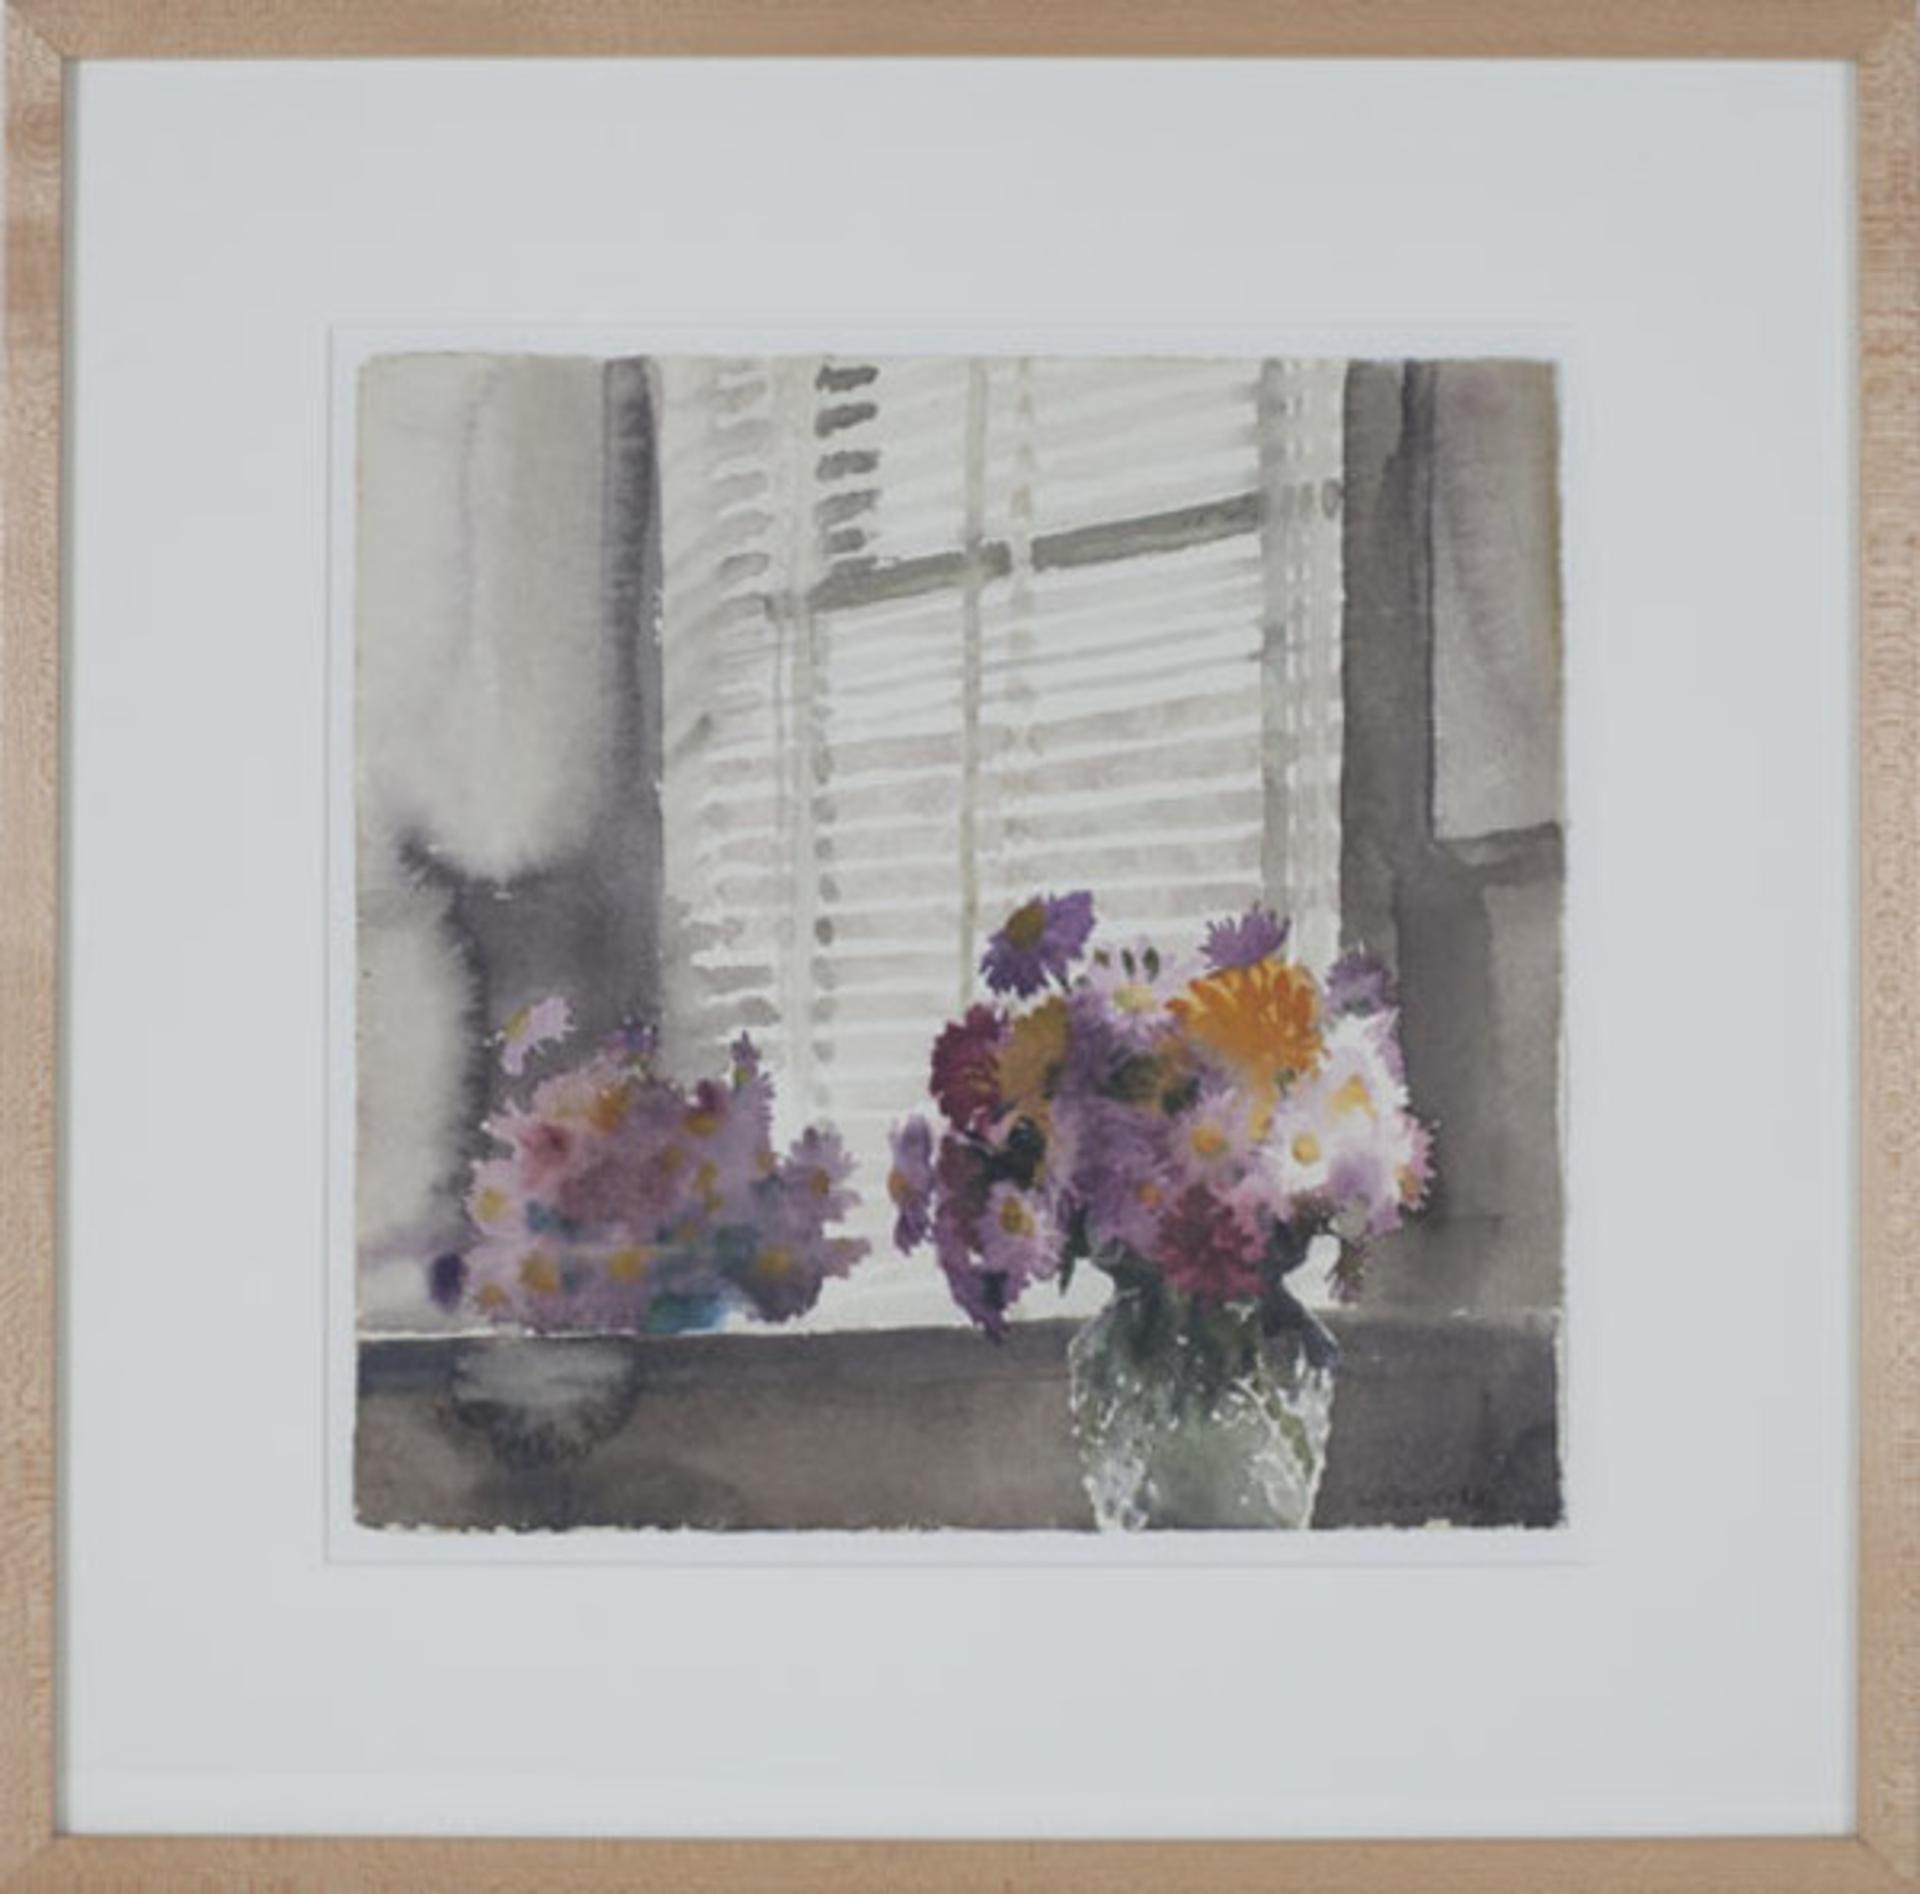 Vase of Chrysanthemums by Alicia Czechowski